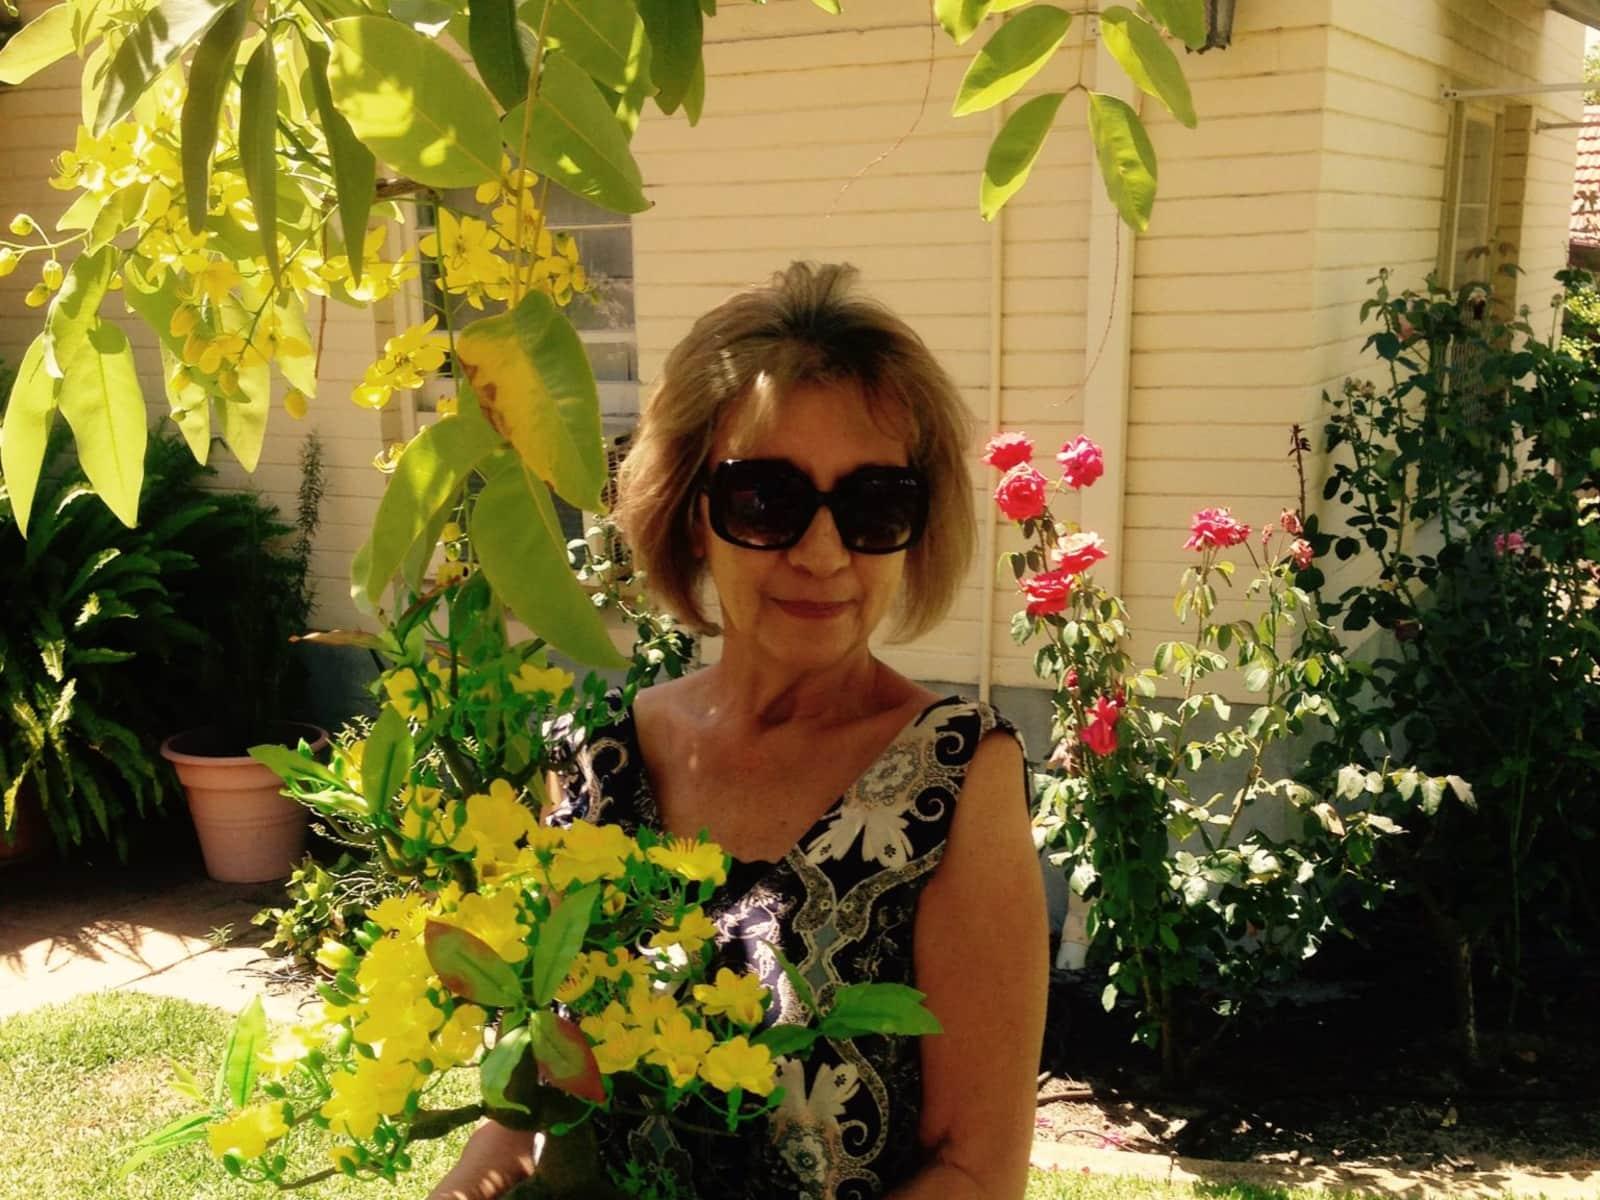 Paulette from Perth, Western Australia, Australia